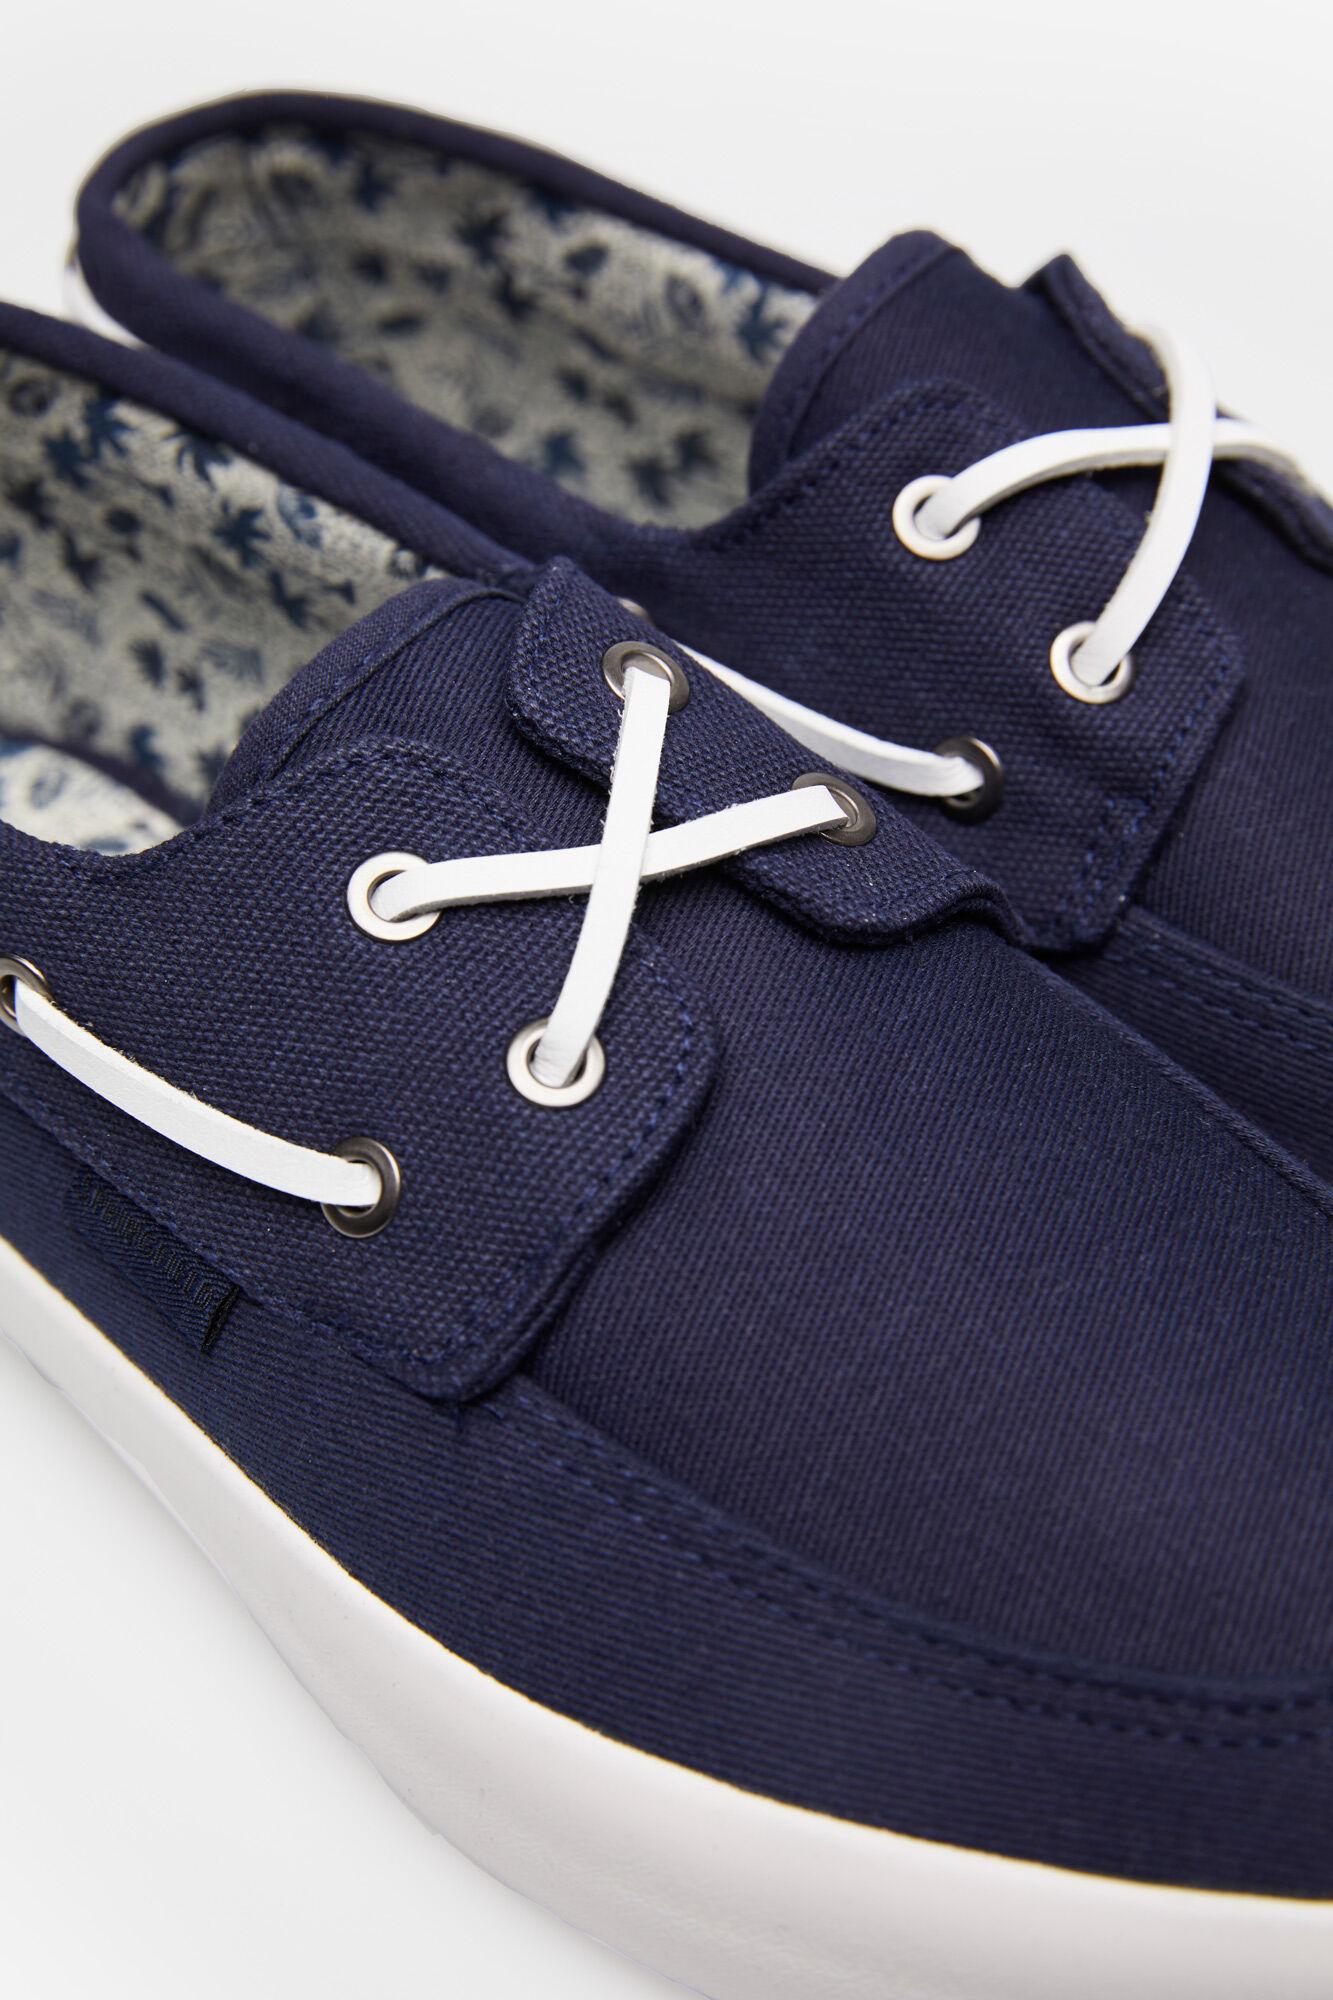 Zapatos De Zapatos De De Zapatos Zapatos HombreSpringfield De HombreSpringfield HombreSpringfield HombreSpringfield Zapatos trQdshC